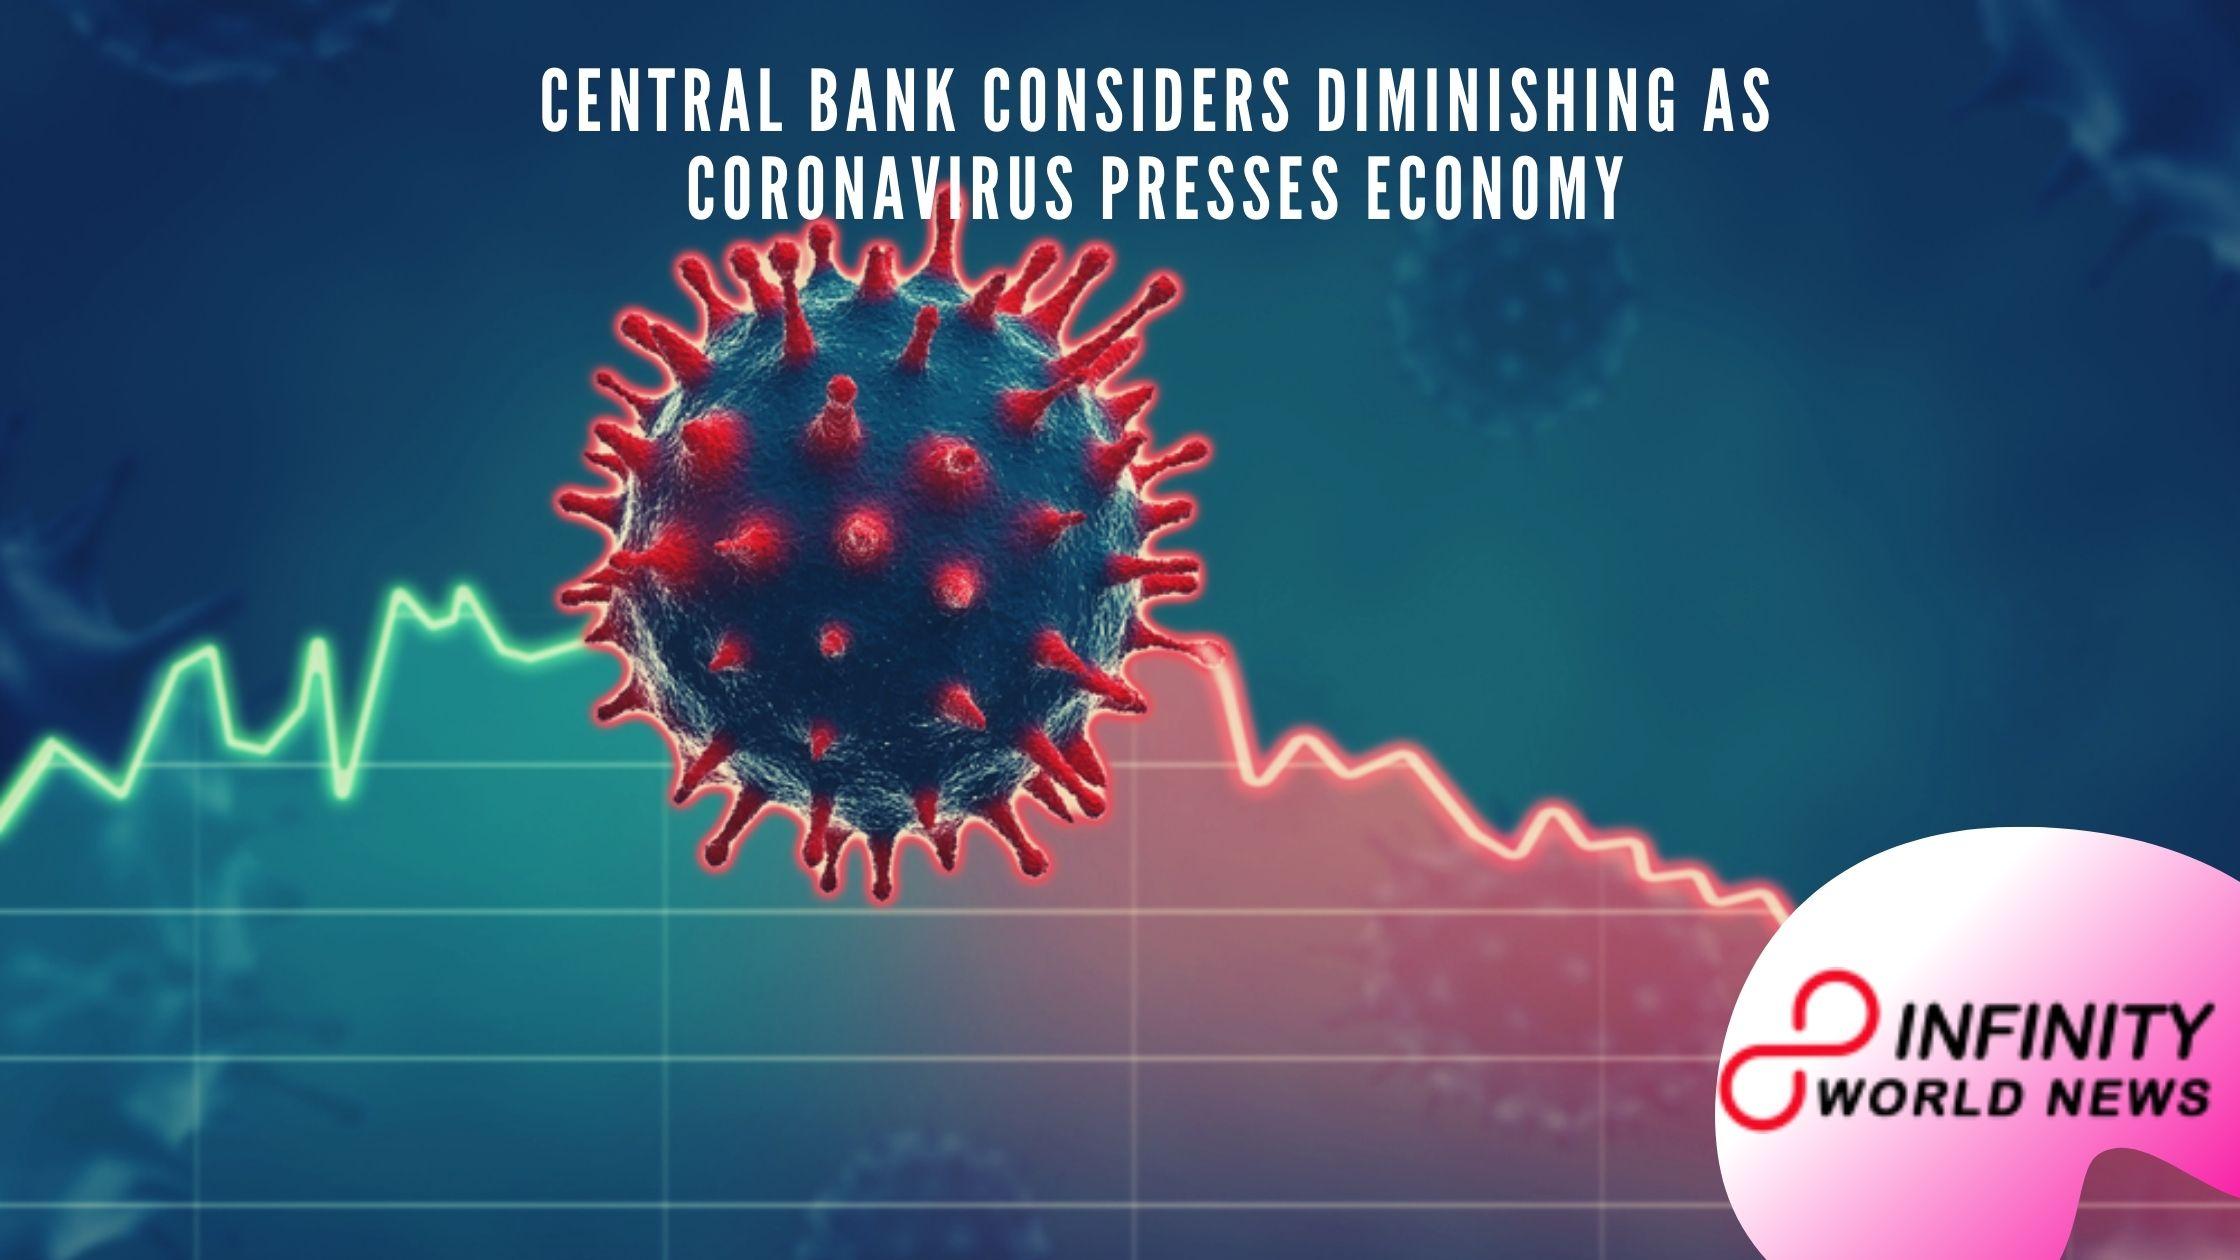 Central bank considers diminishing as coronavirus presses economy